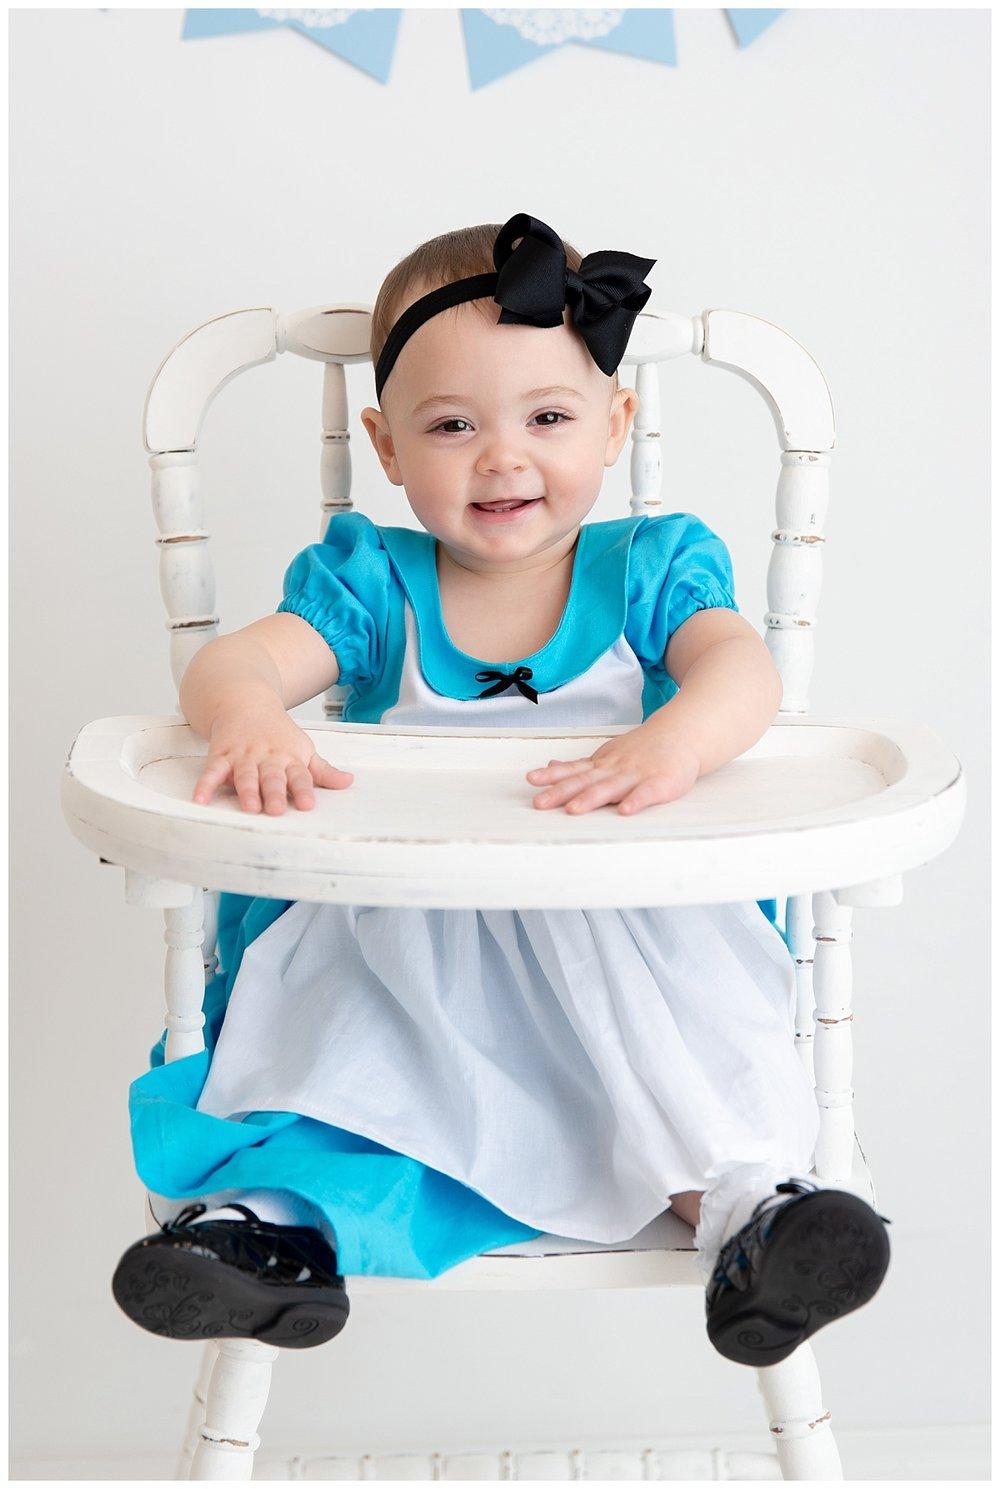 st-louis-birthday-photographer-alice-in-wonderland-dress-baby-girl-sitting-in-white-highchair.jpg